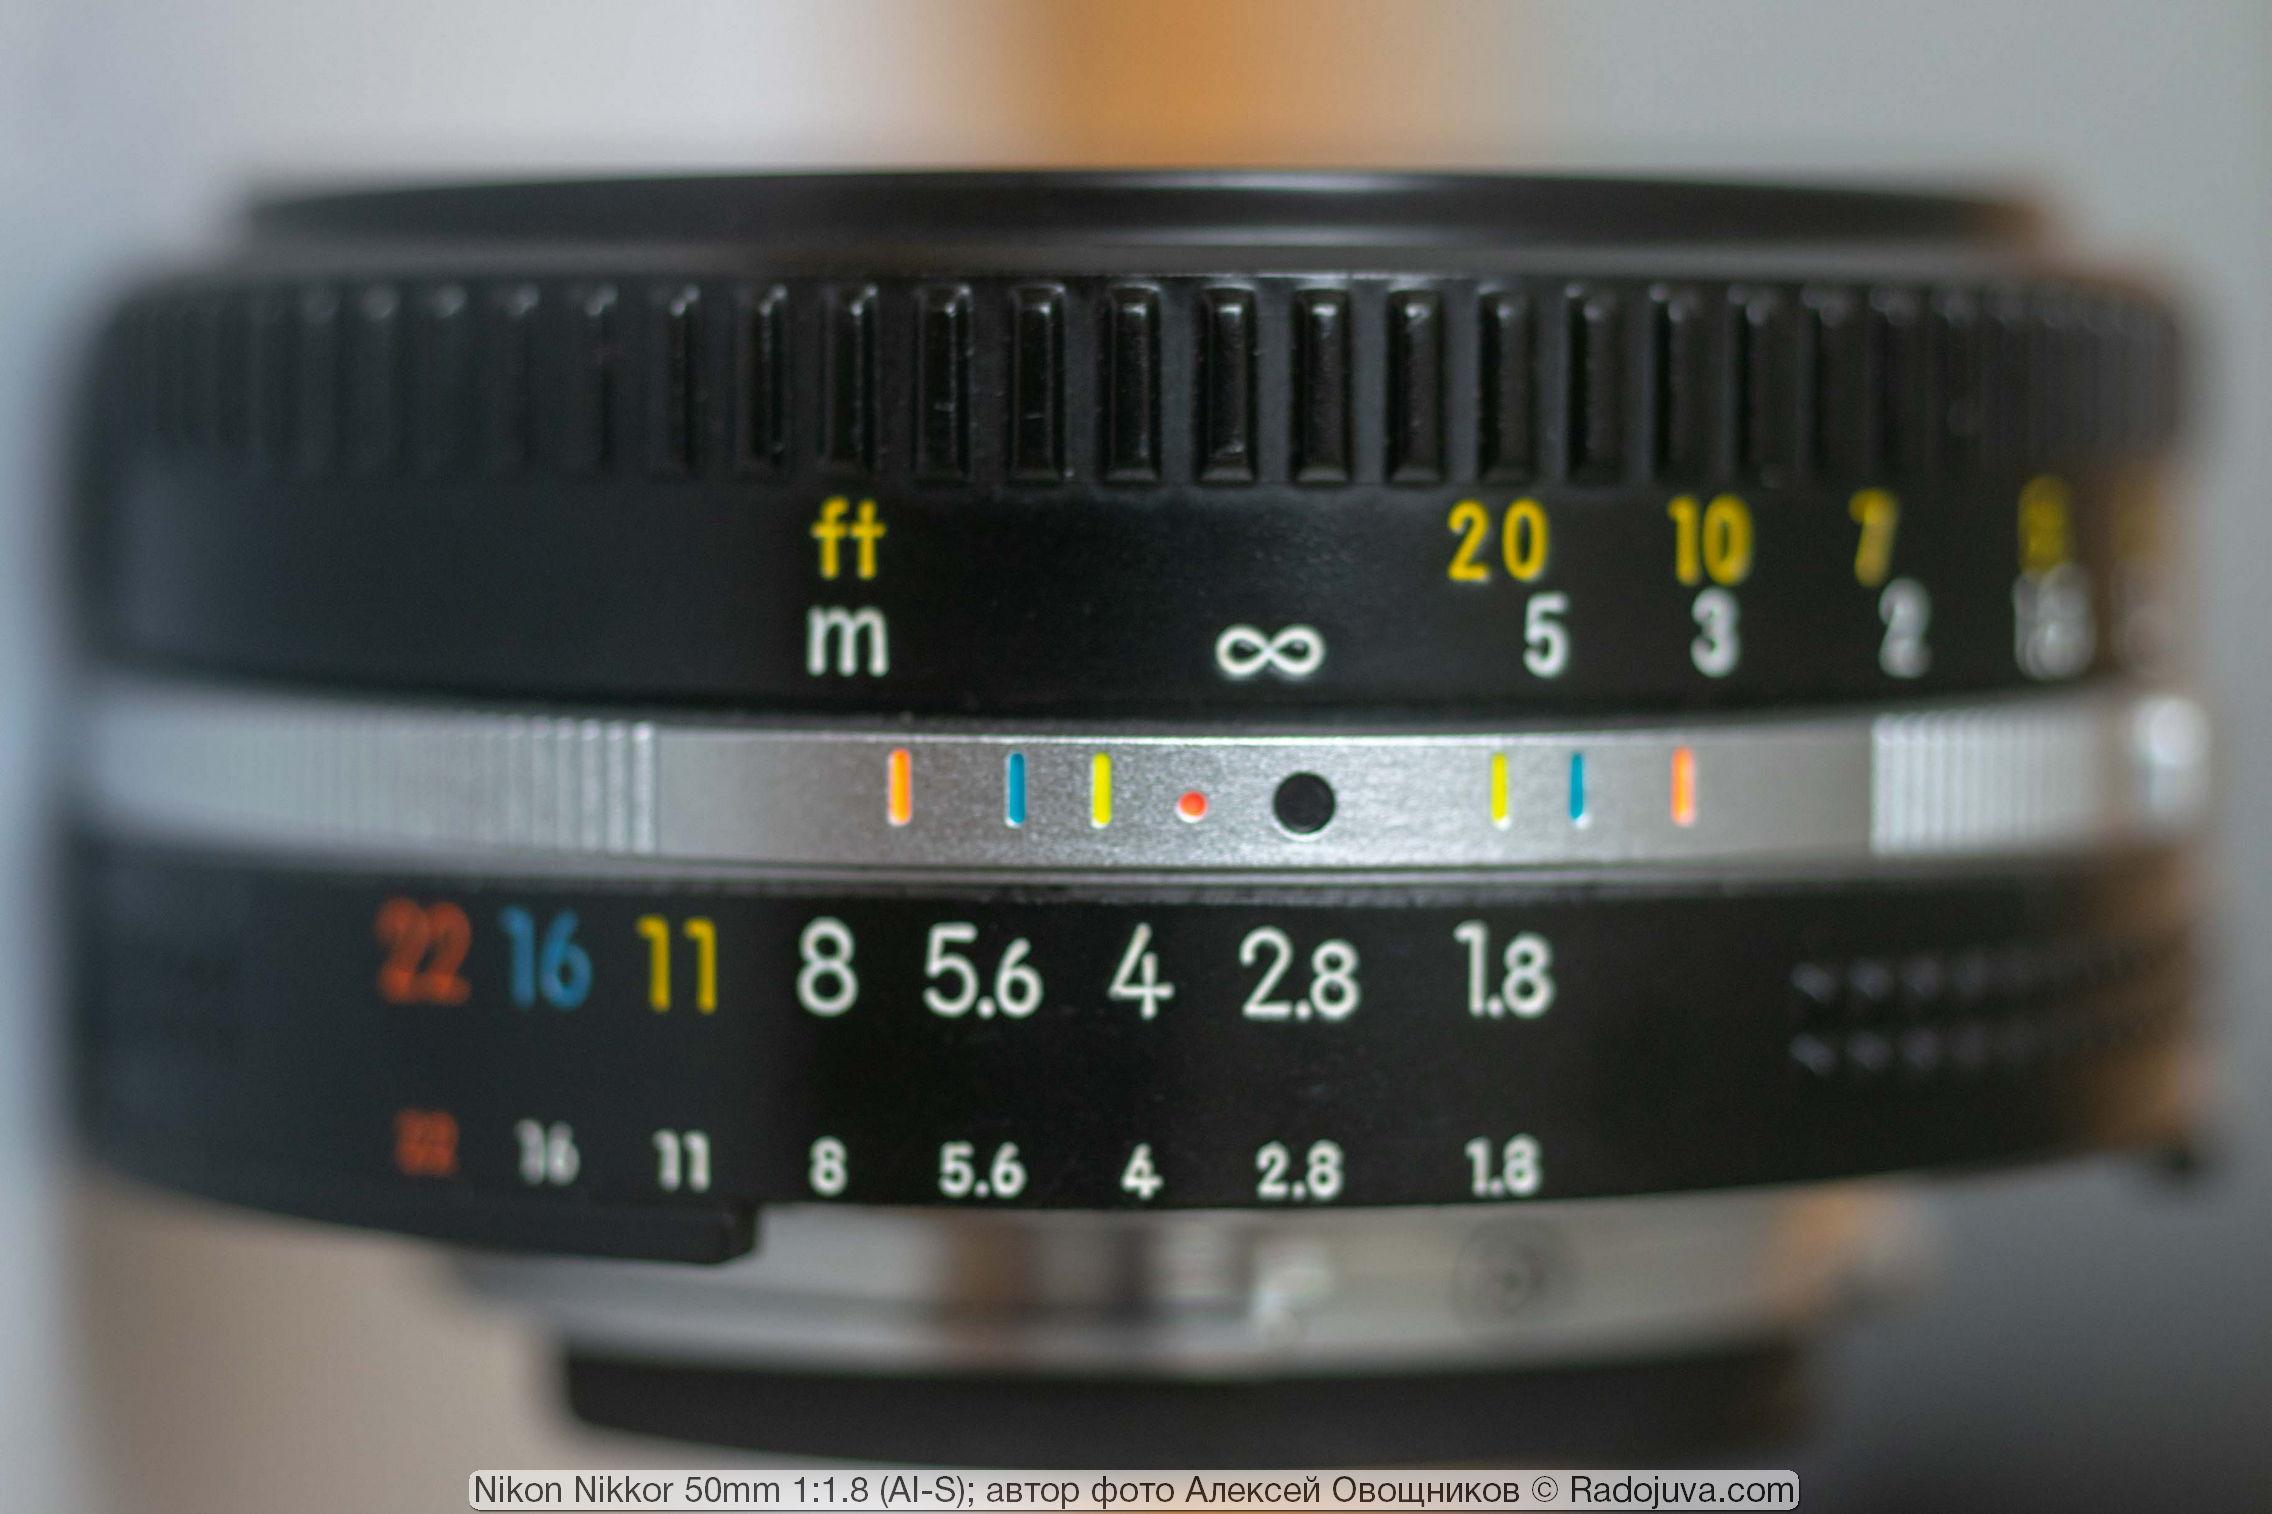 Nikon Nikkor 50mm 1:1.8 (AI-S)